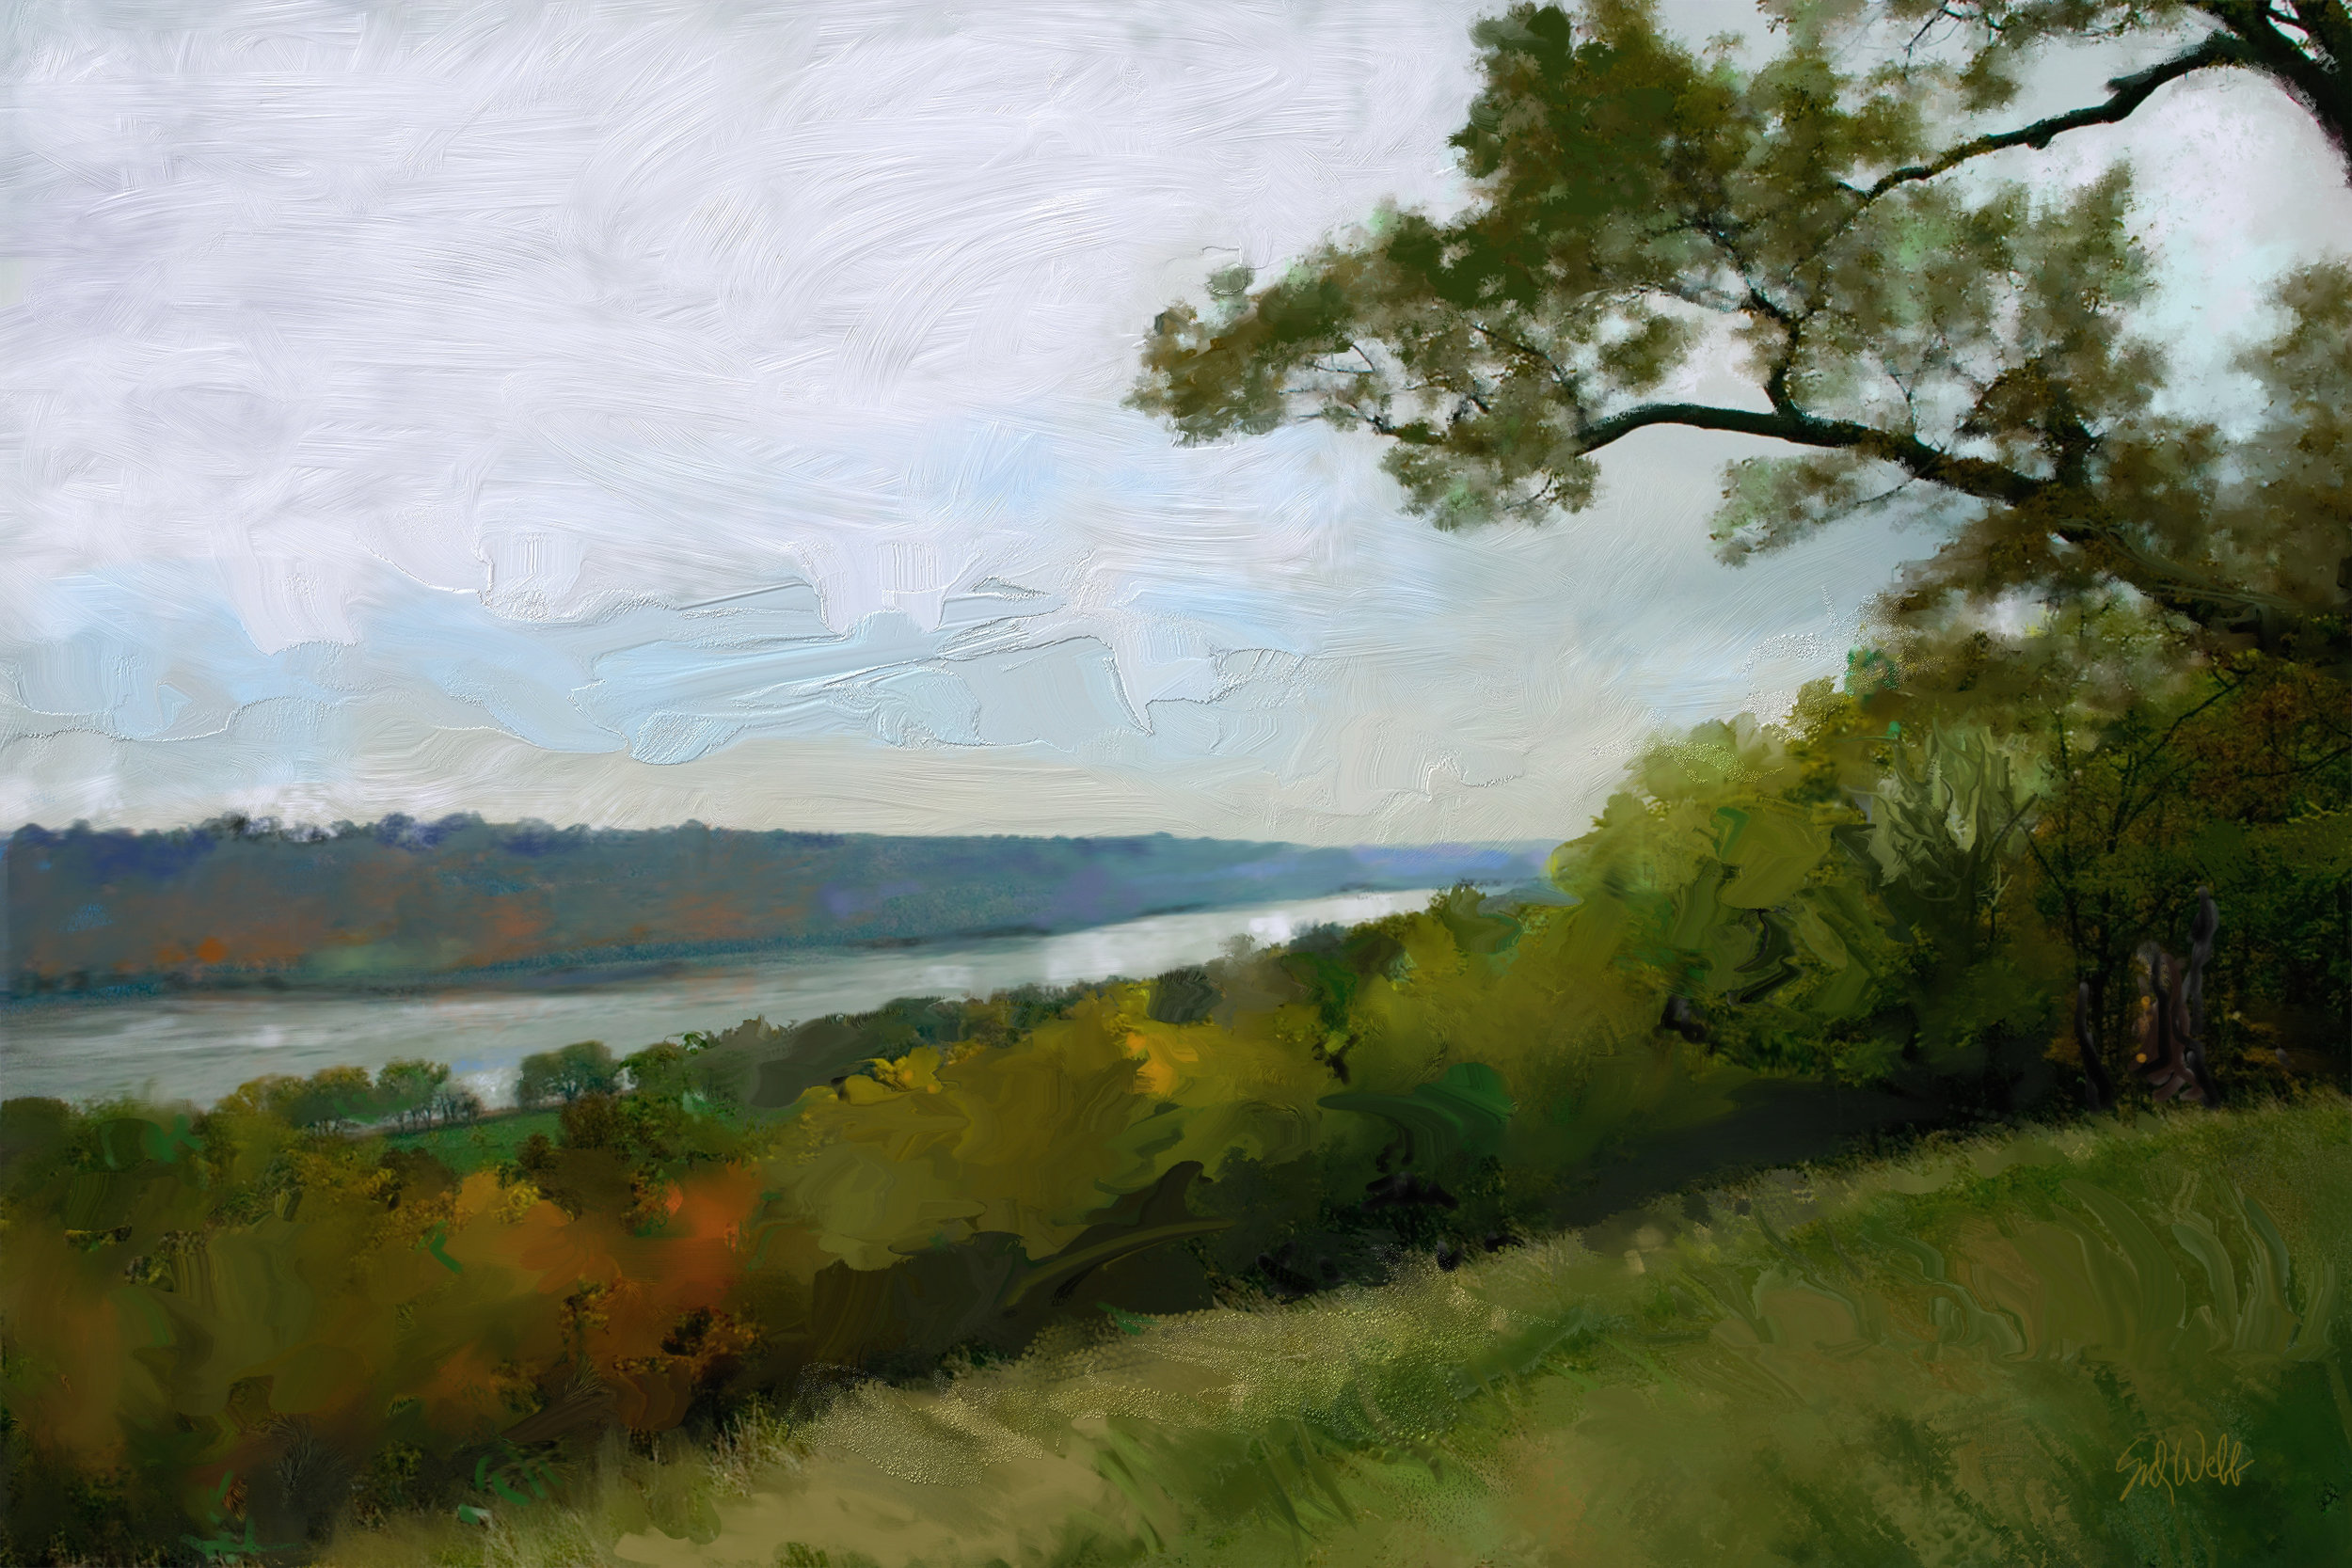 """Ohio River"" by Sid Webb, Print, mixed media, 12x18in, 2018, $125"